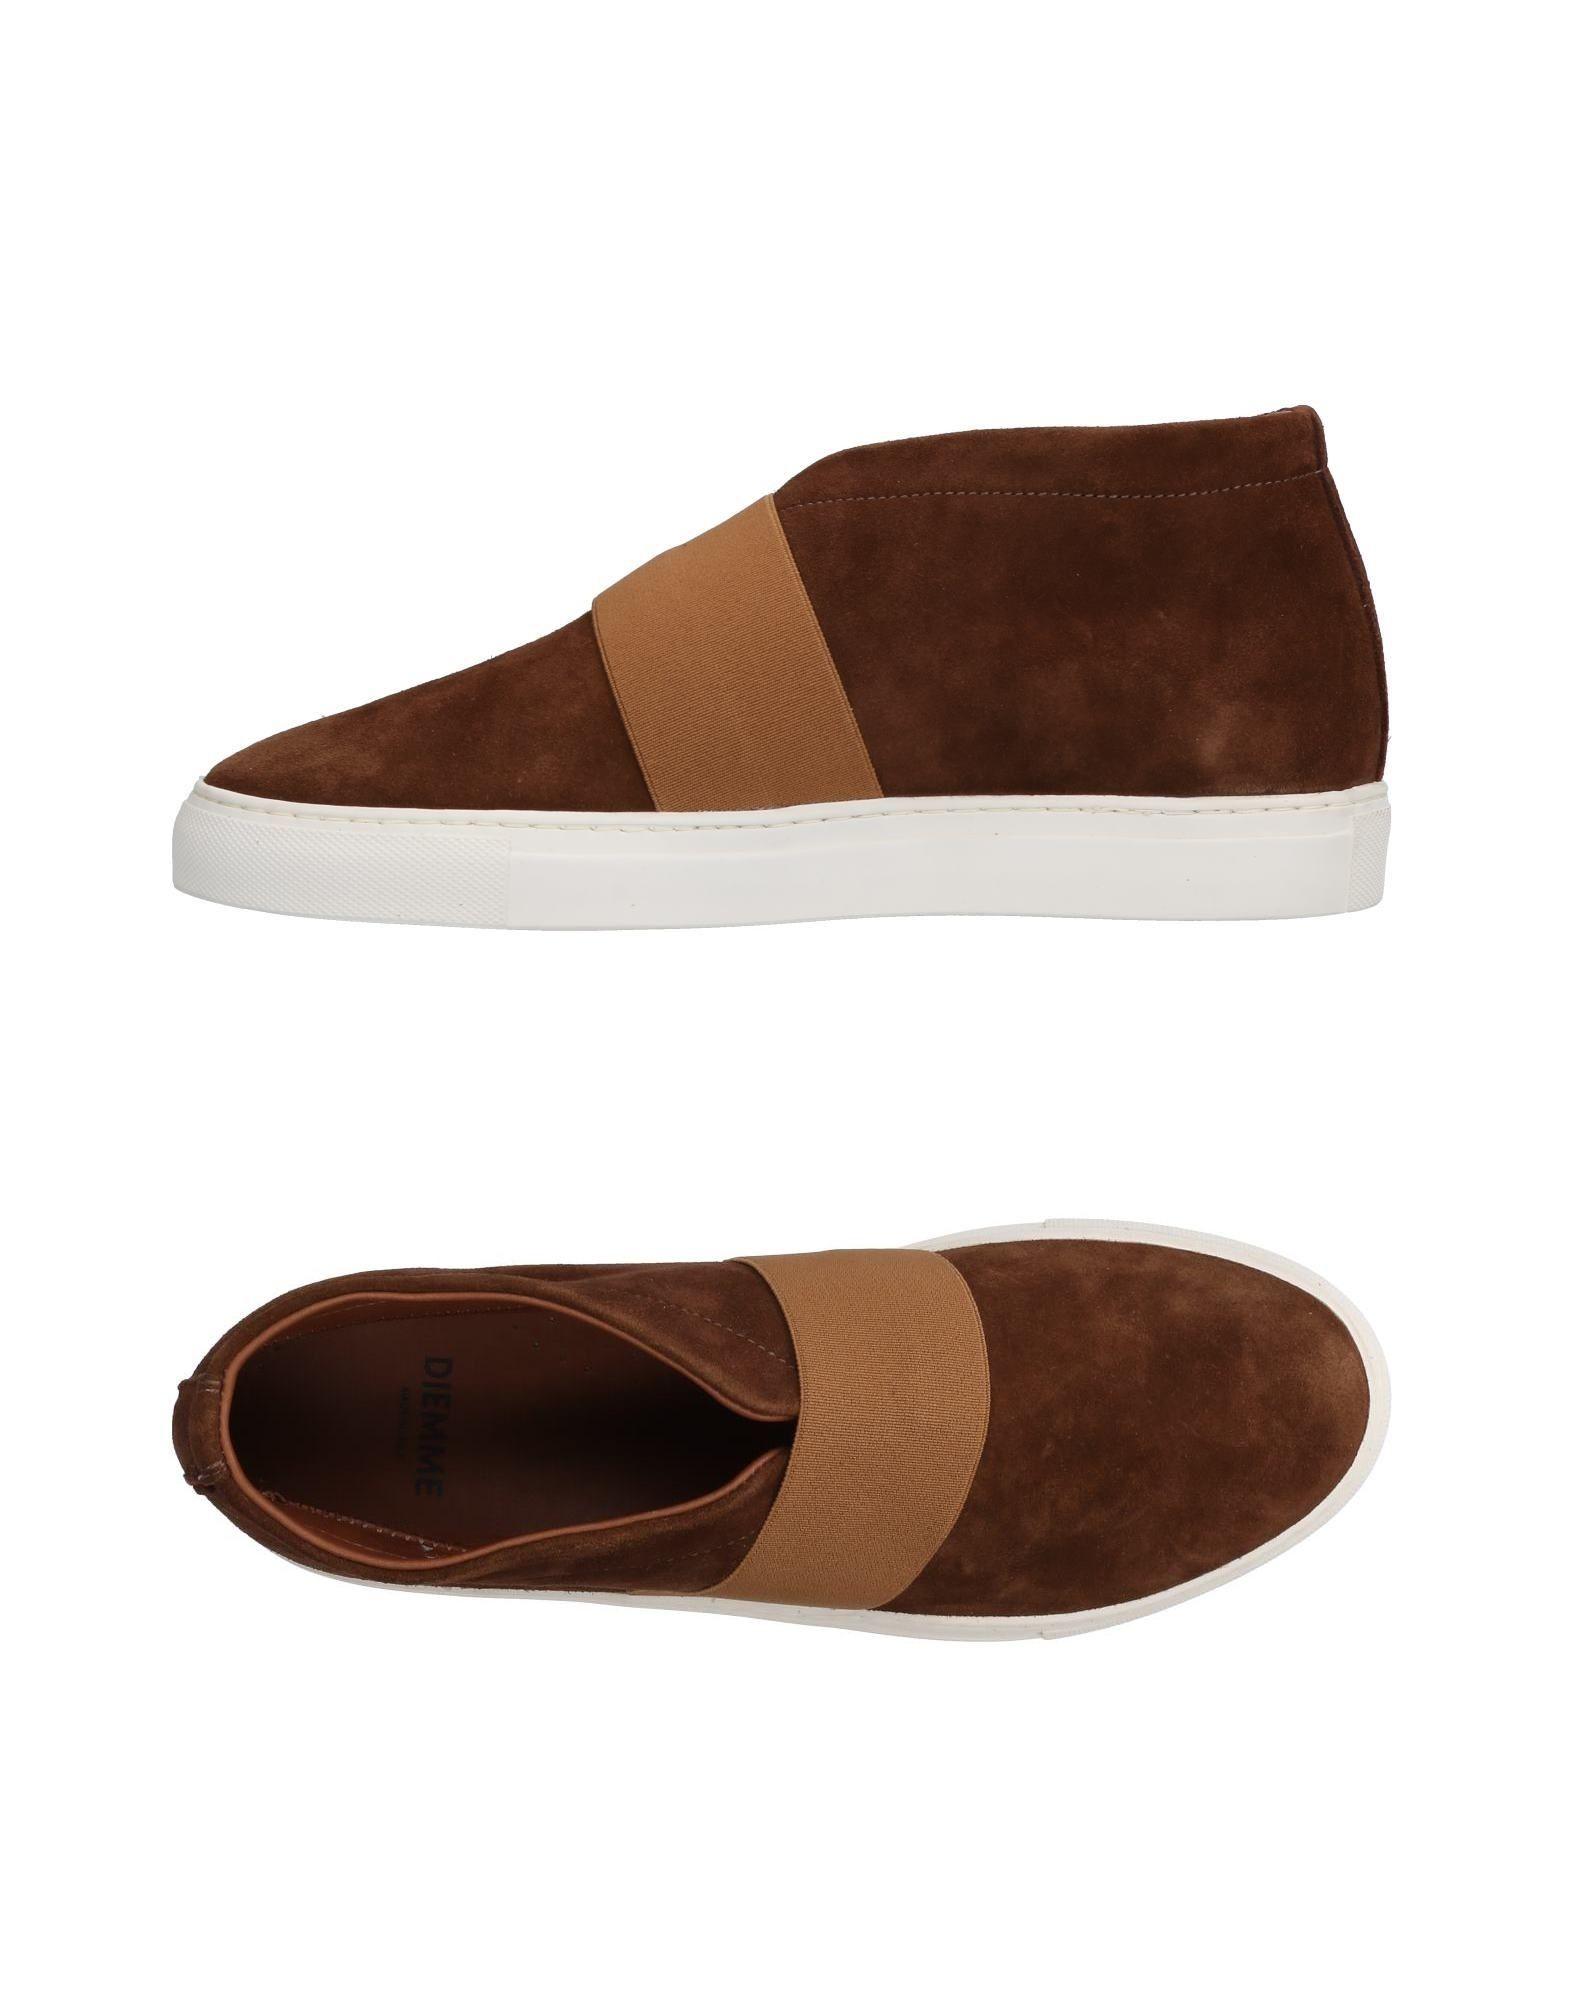 Diemme Sneakers Herren  11507413UG Gute Qualität beliebte Schuhe